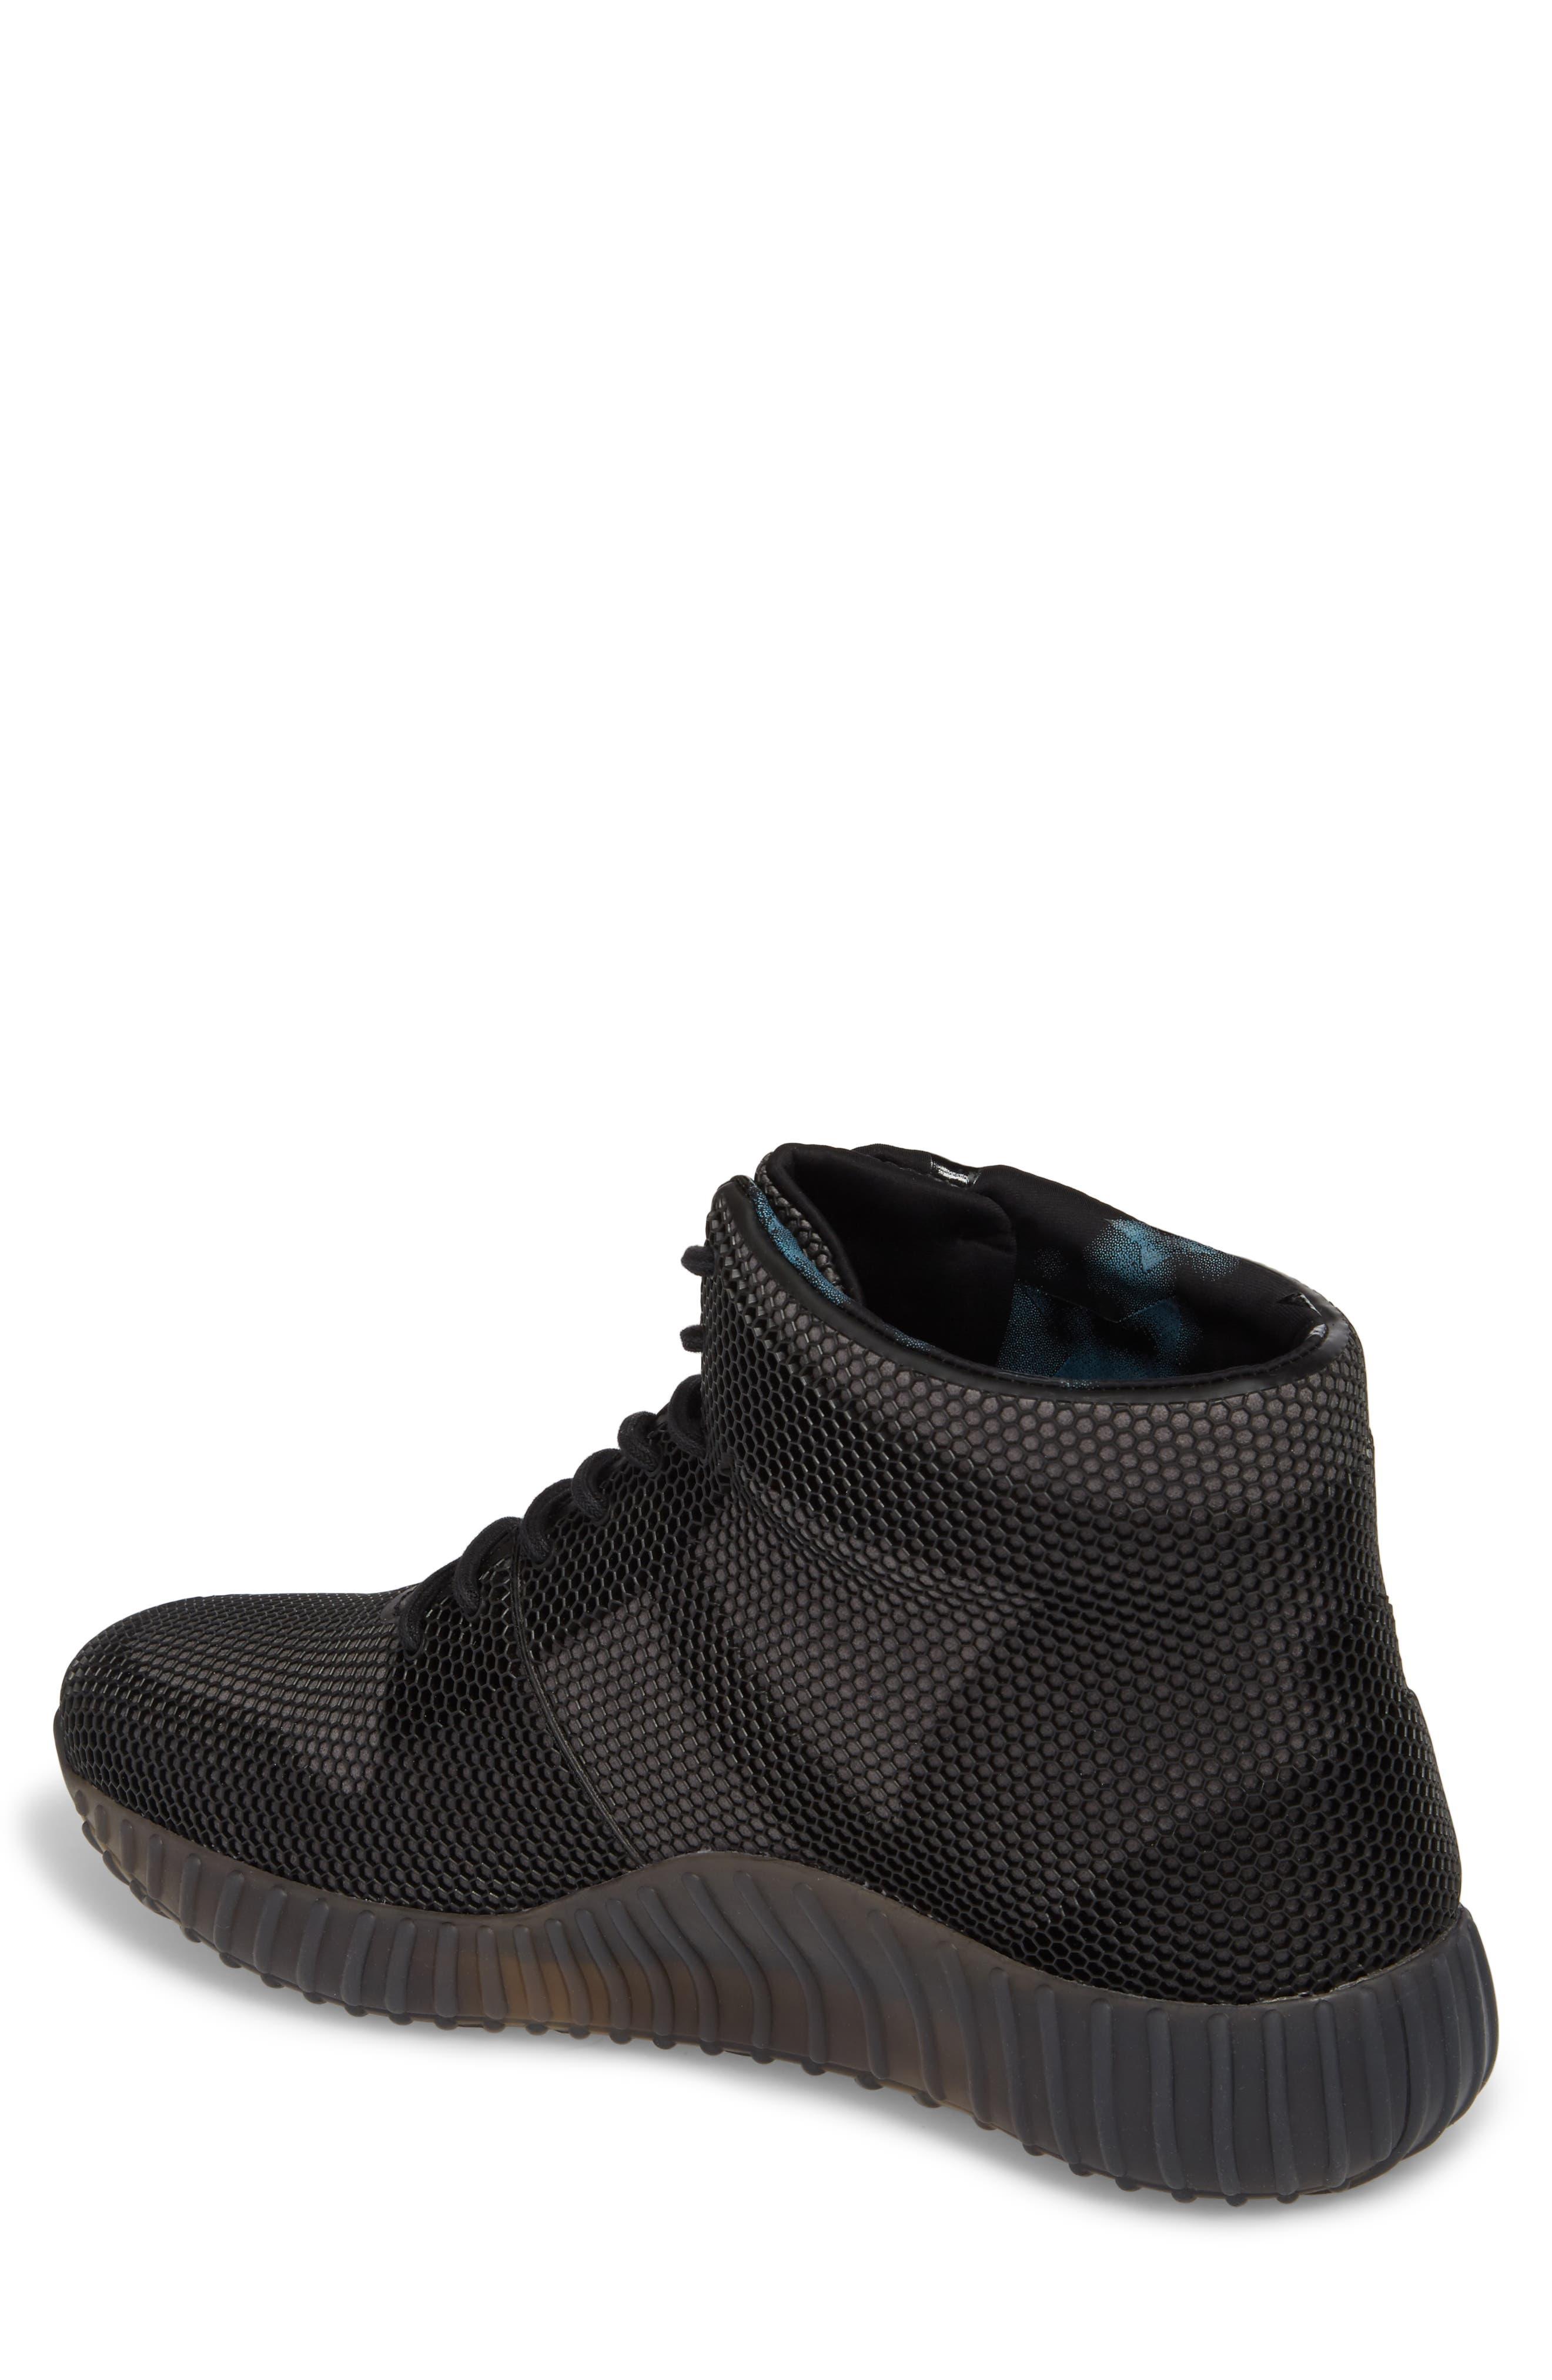 Mid-Top Sneaker,                             Alternate thumbnail 2, color,                             Black